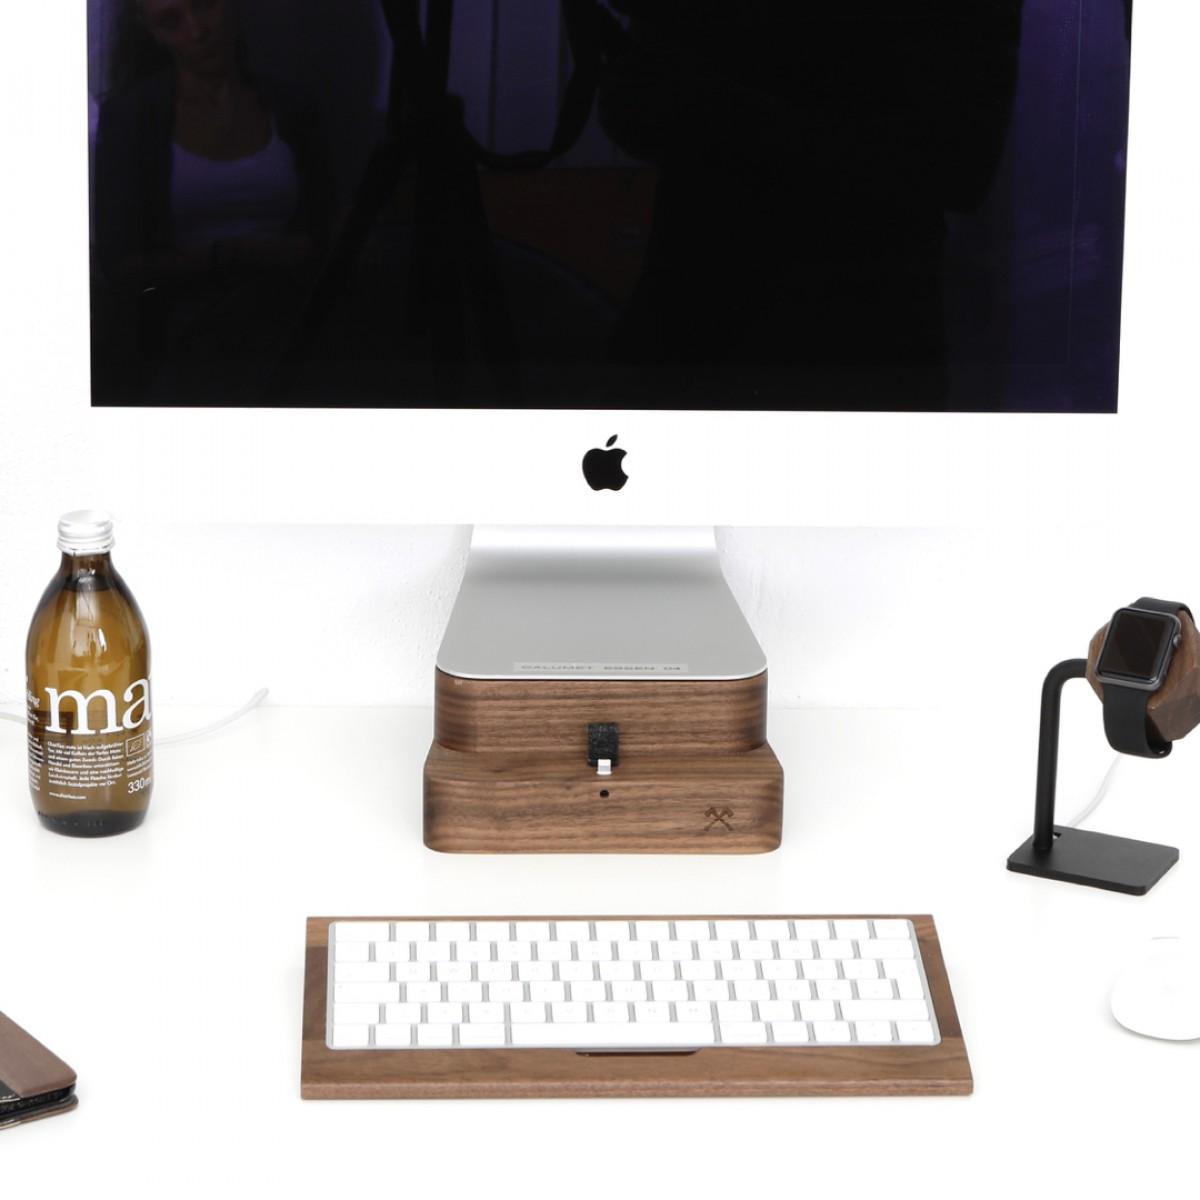 "Woodcessories - EcoFoot Dock Edt. - Premium iMac Stand + iPhone Dock für den Apple iMac & alle iPhones aus massivem Holz (iMac 21,5"", Eiche)"